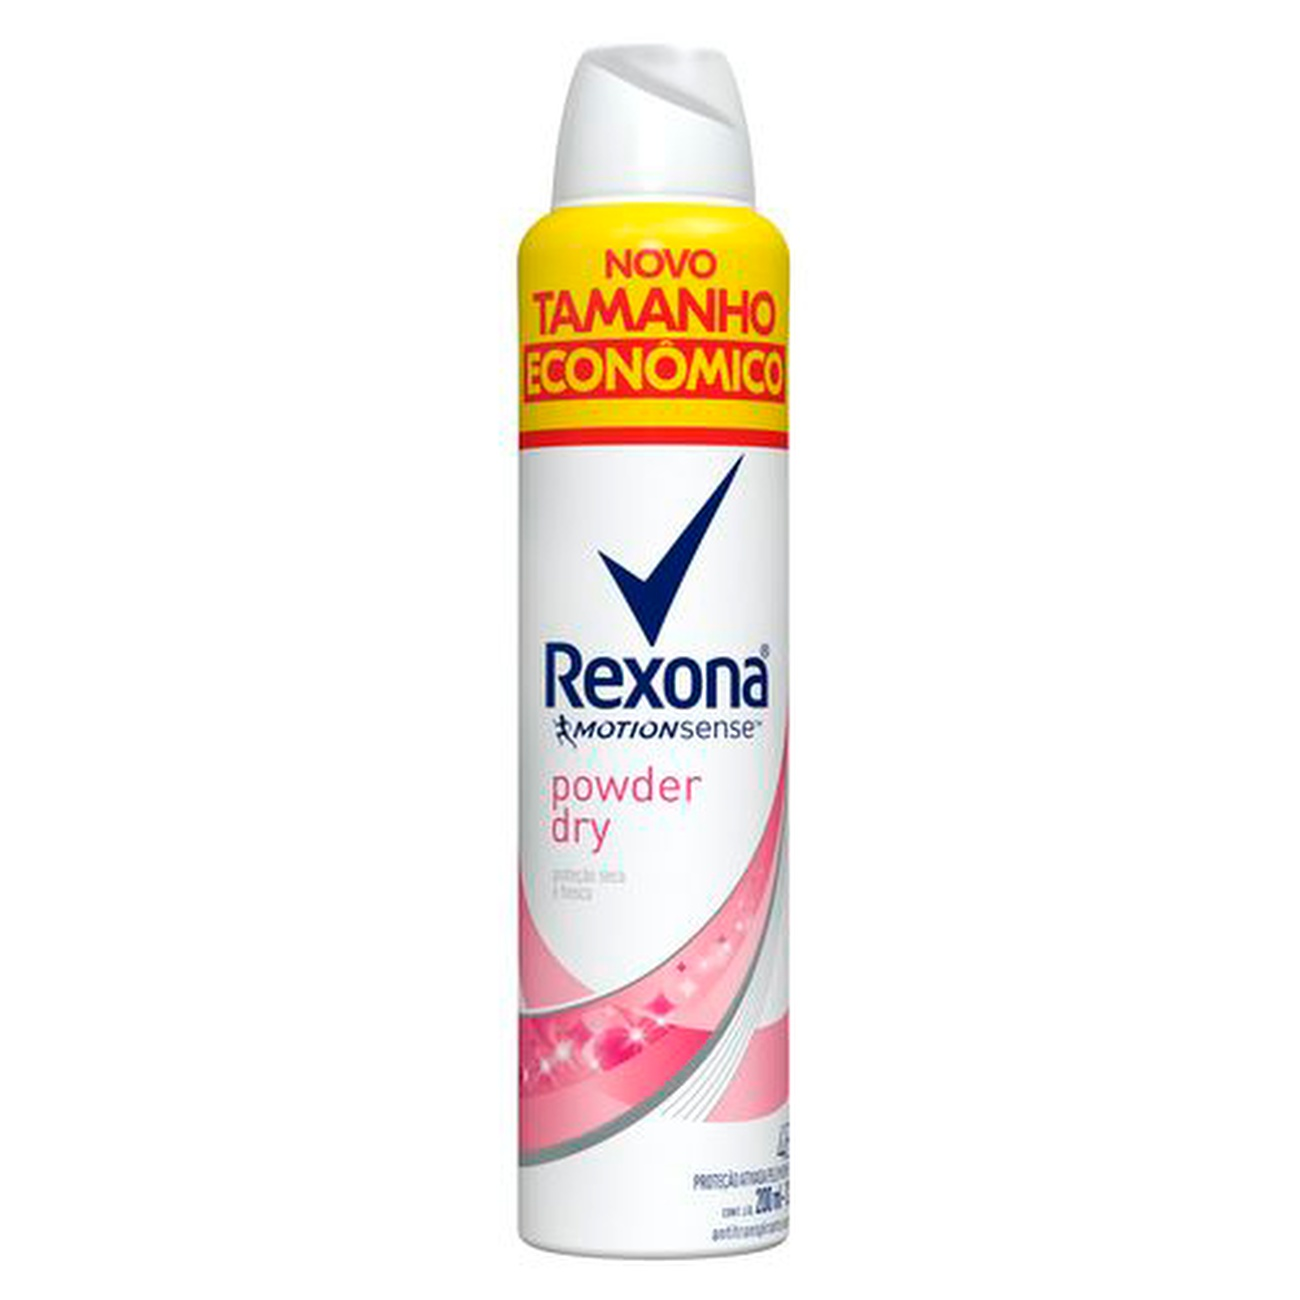 Desodorante Antitranspirante Aerosol Rexona Feminino Powder Dry 200ml | Caixa com 1